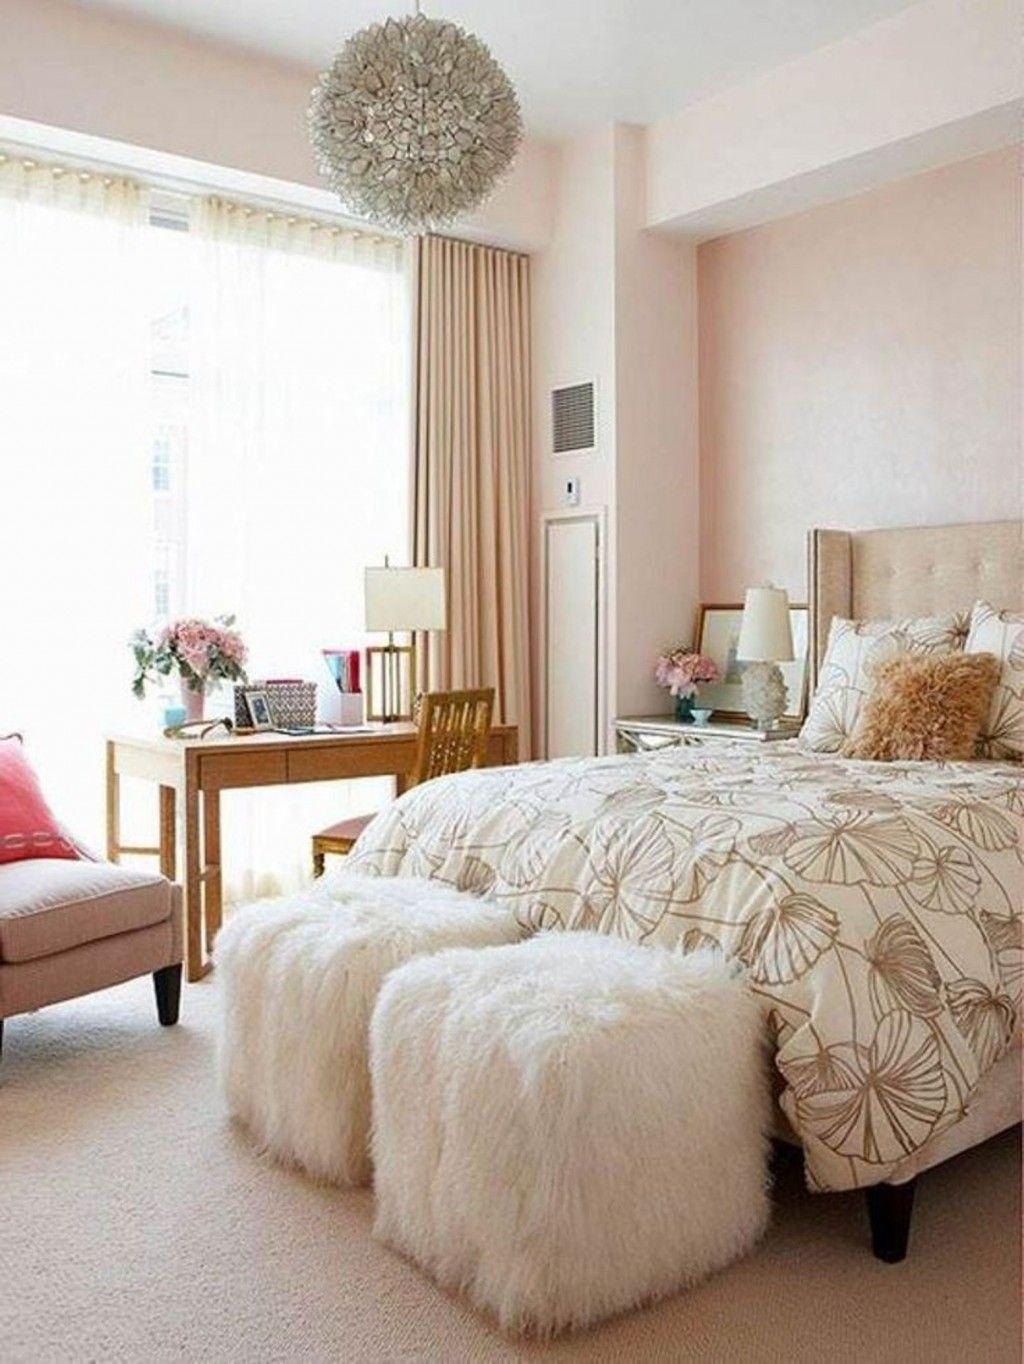 Ofancygallerybedroomideasforyoungadultsbedroomideasfor - Bedroom furniture for young adults